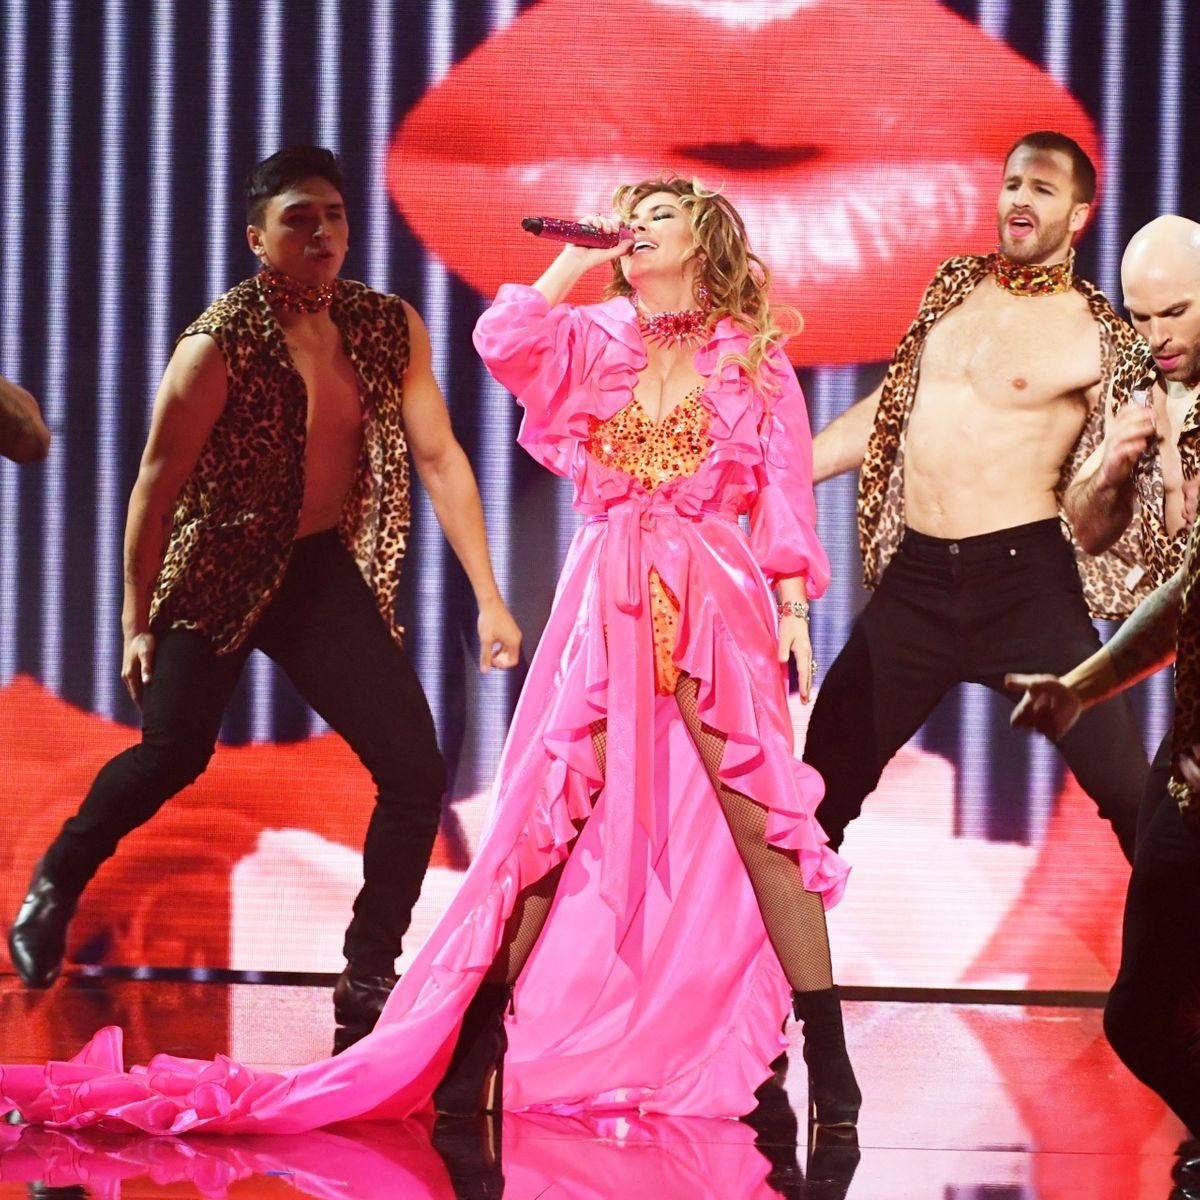 AMAs 2019: Shania Twain's Closing-Medley Performance [Video]